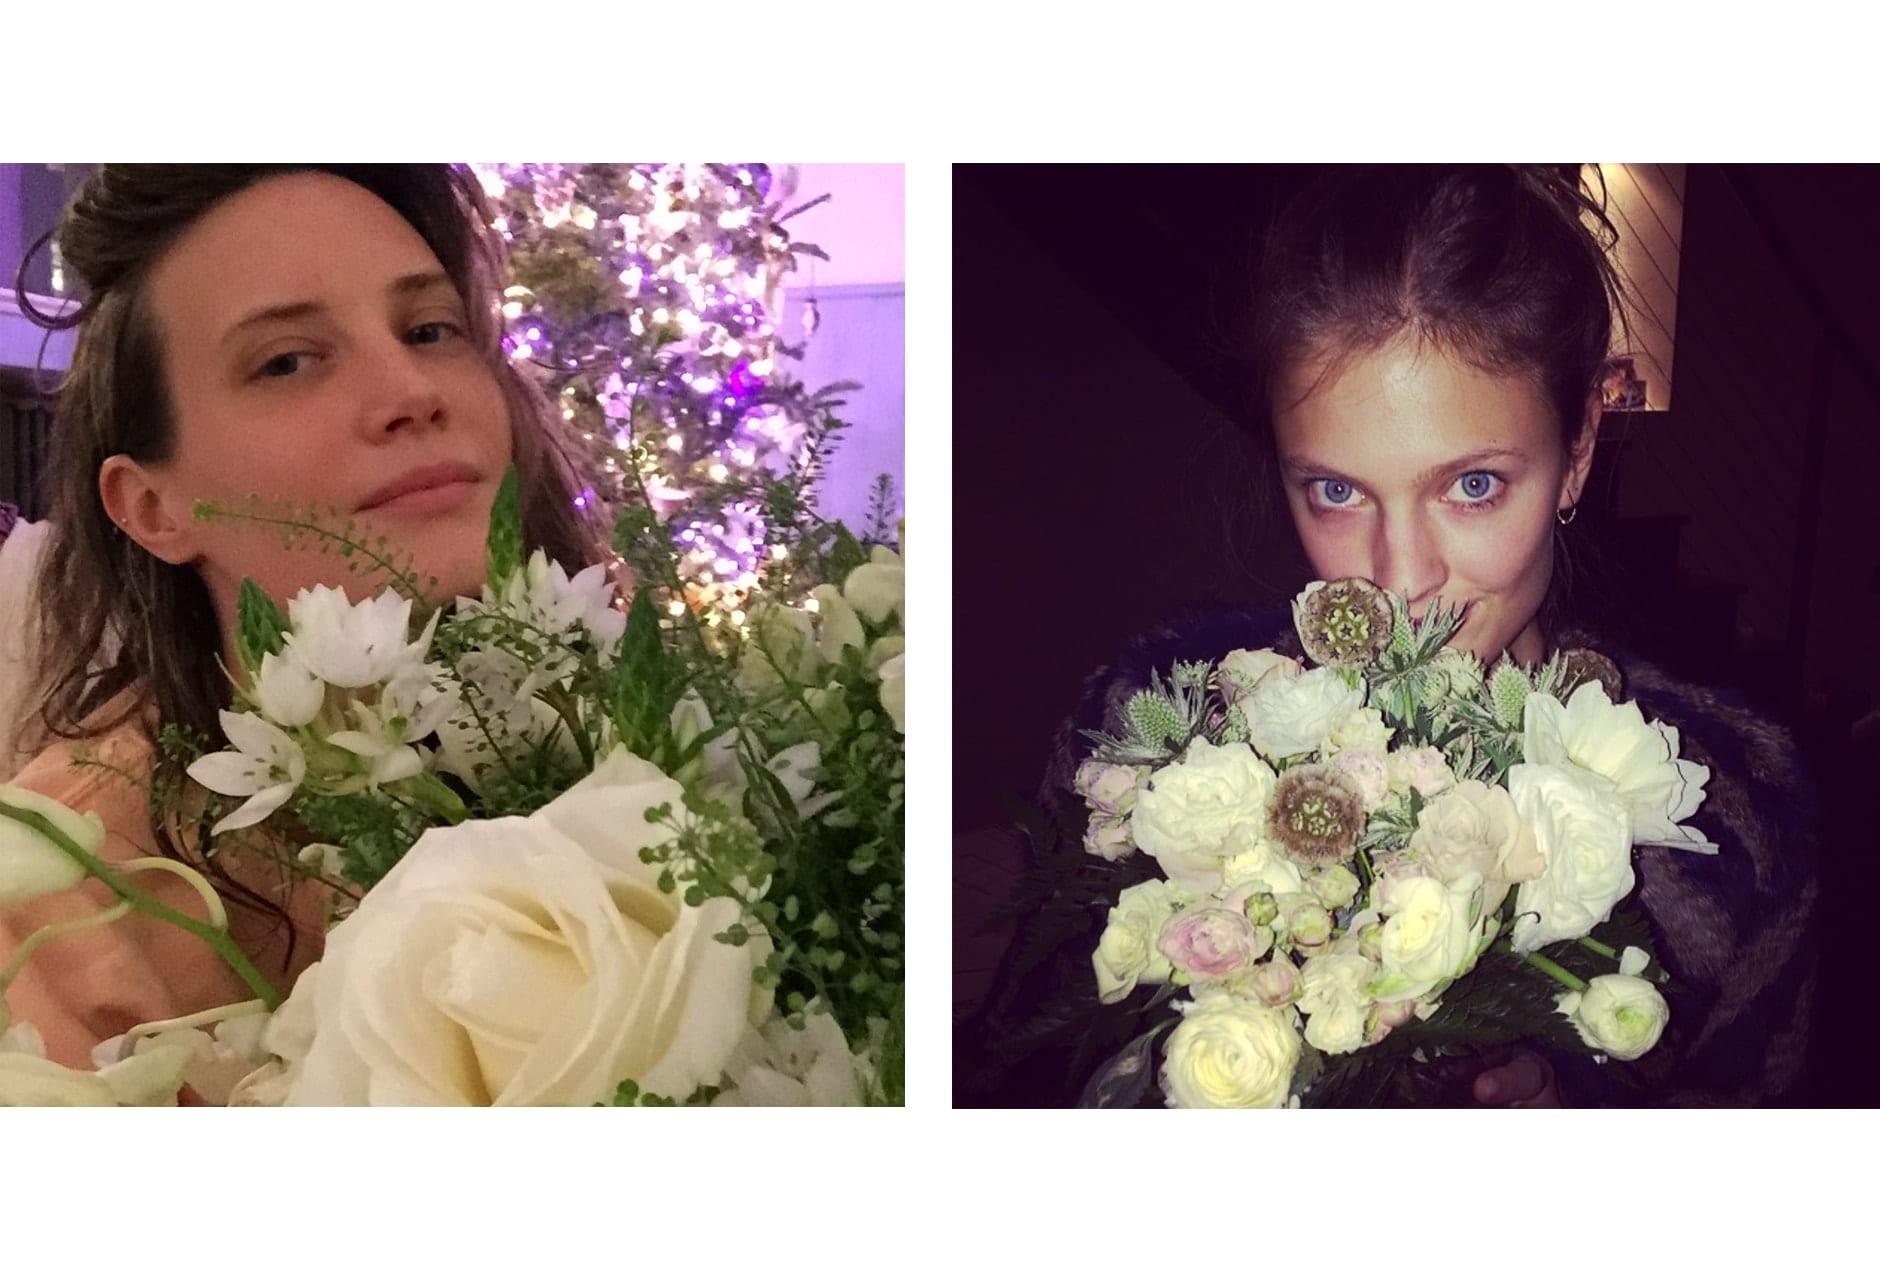 FLOWERS_drakeburnette_constancejablonksi-min